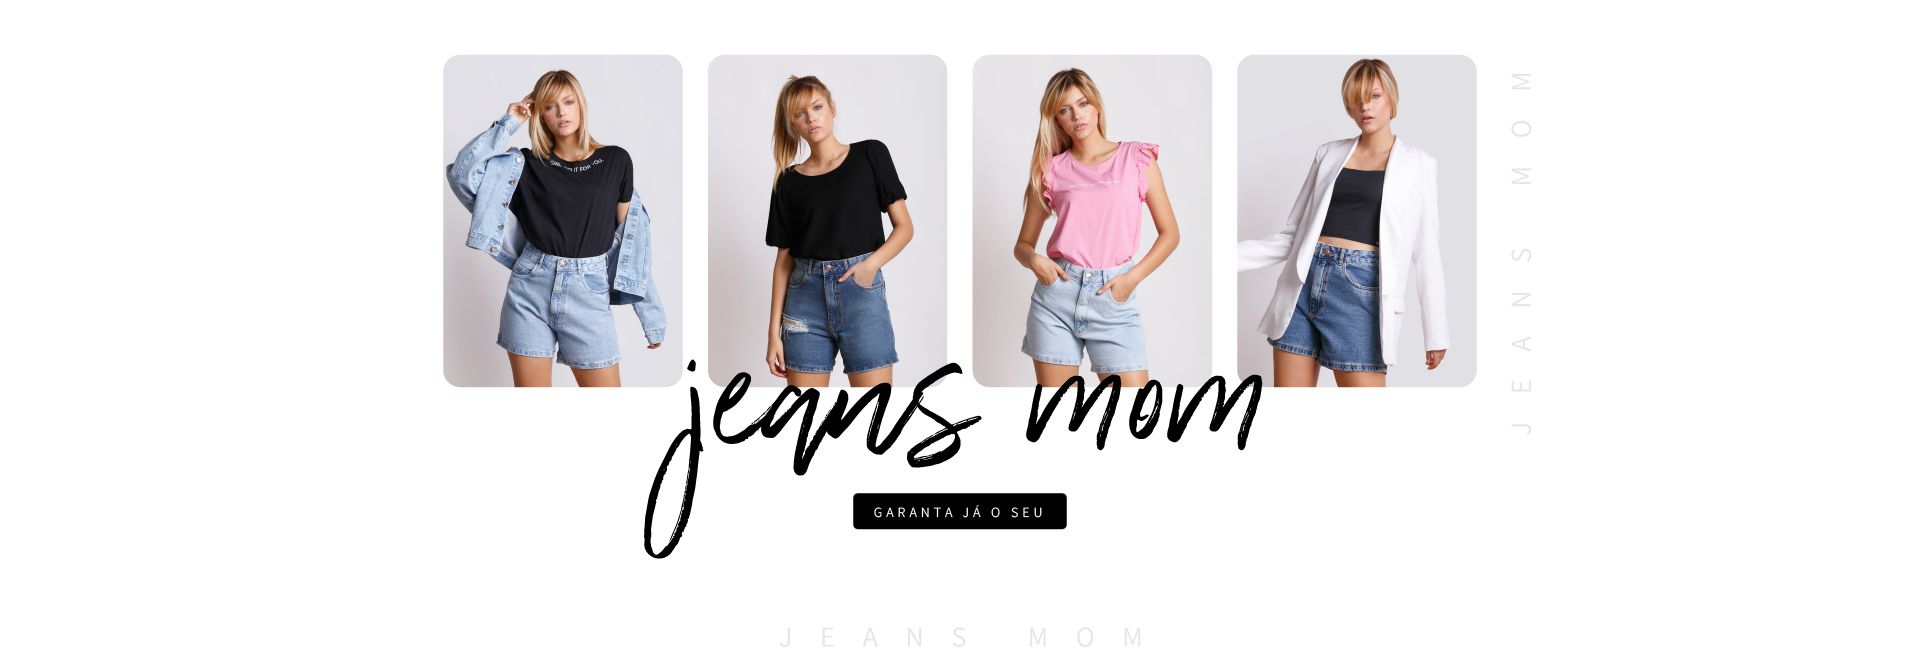 SHORT JEANS MOM CLARIÁ